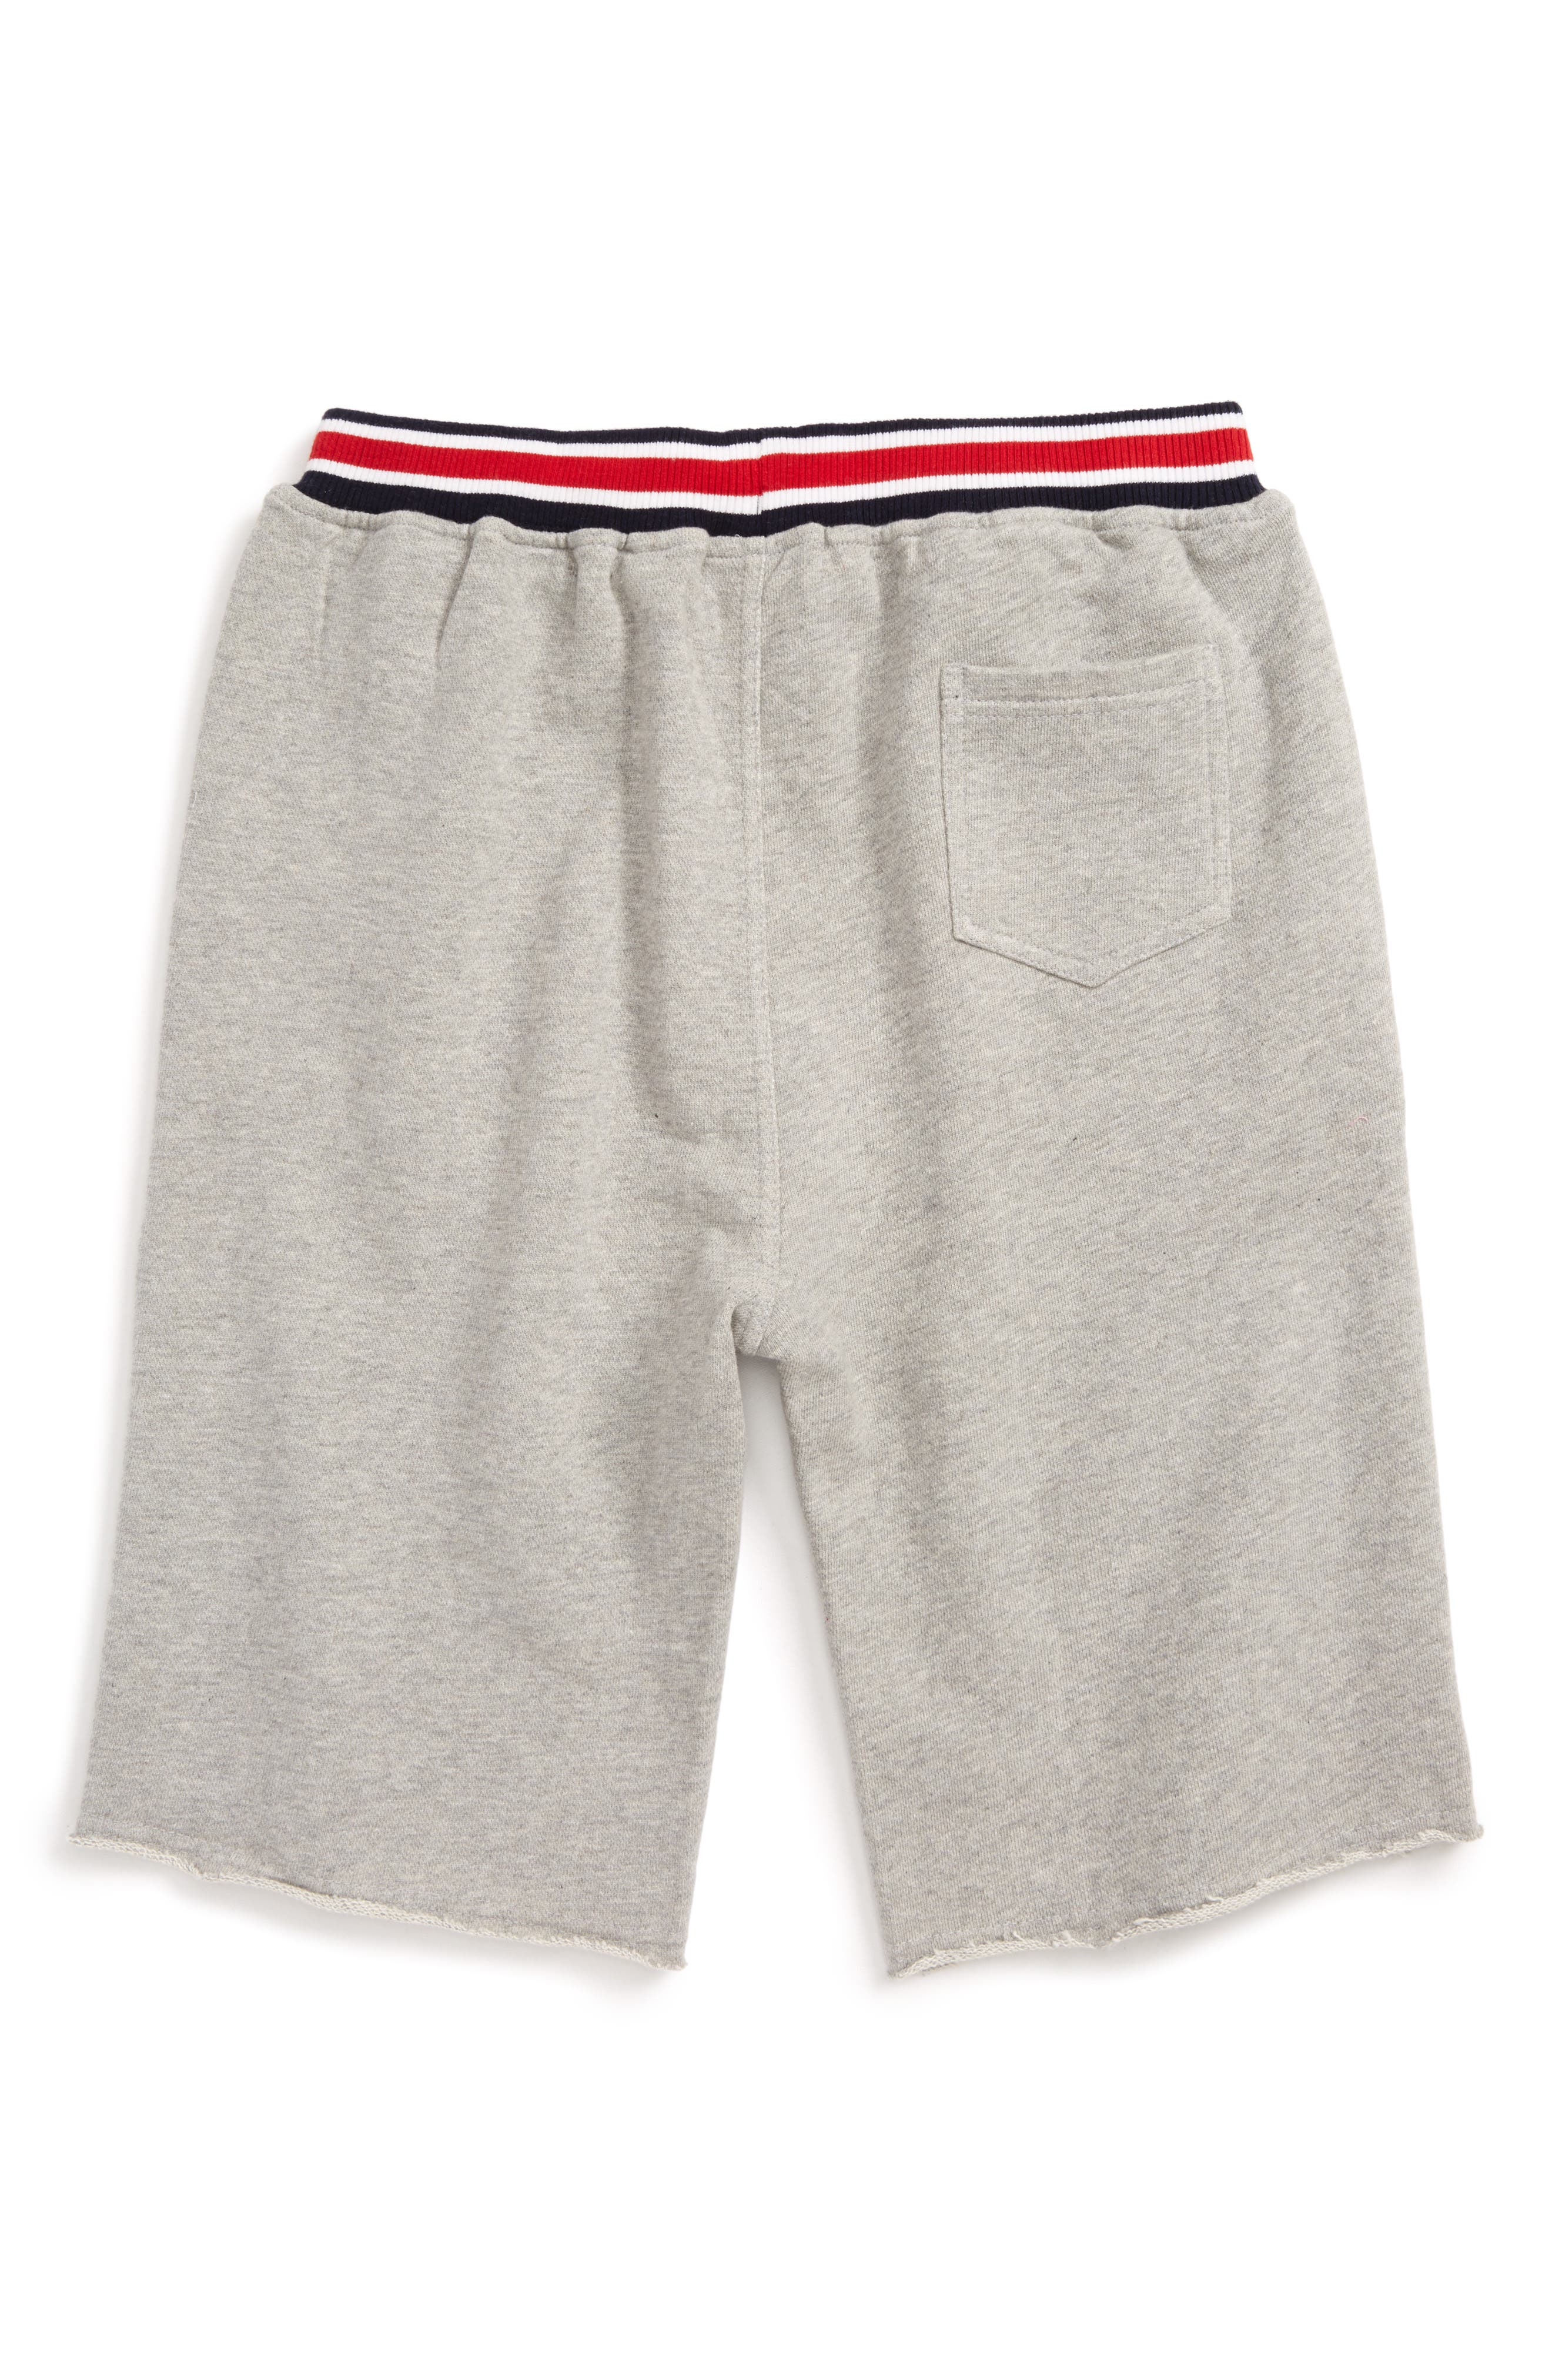 Varsity Knit Shorts,                             Alternate thumbnail 2, color,                             020